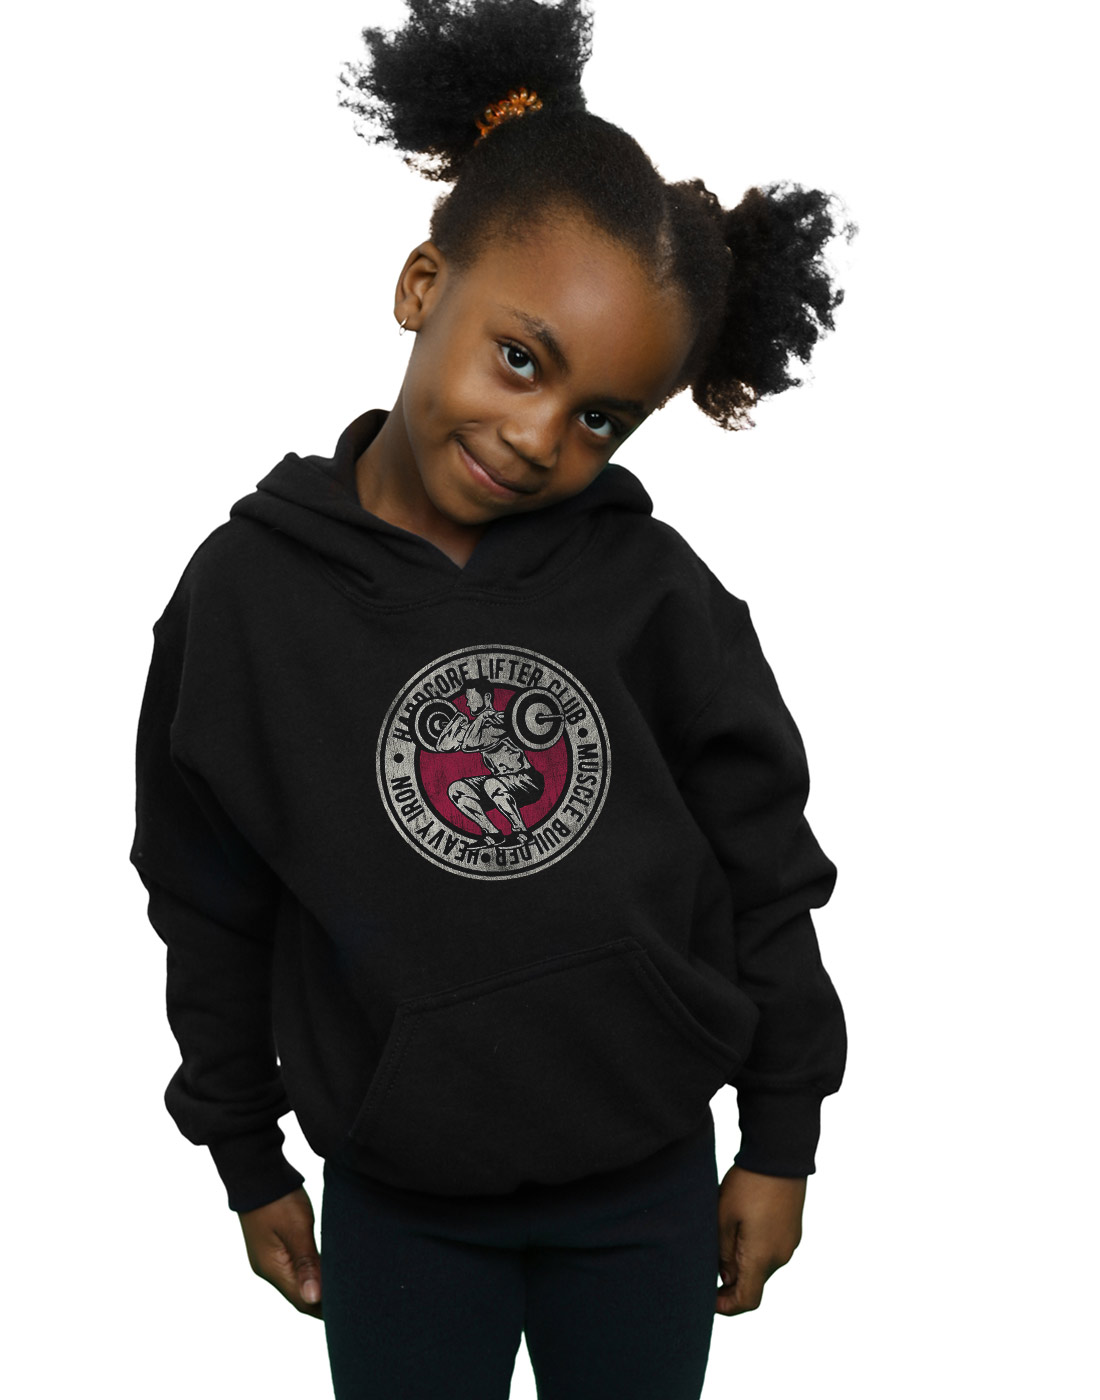 Absolute Cult Drewbacca Girls IFL Recycling Sweatshirt